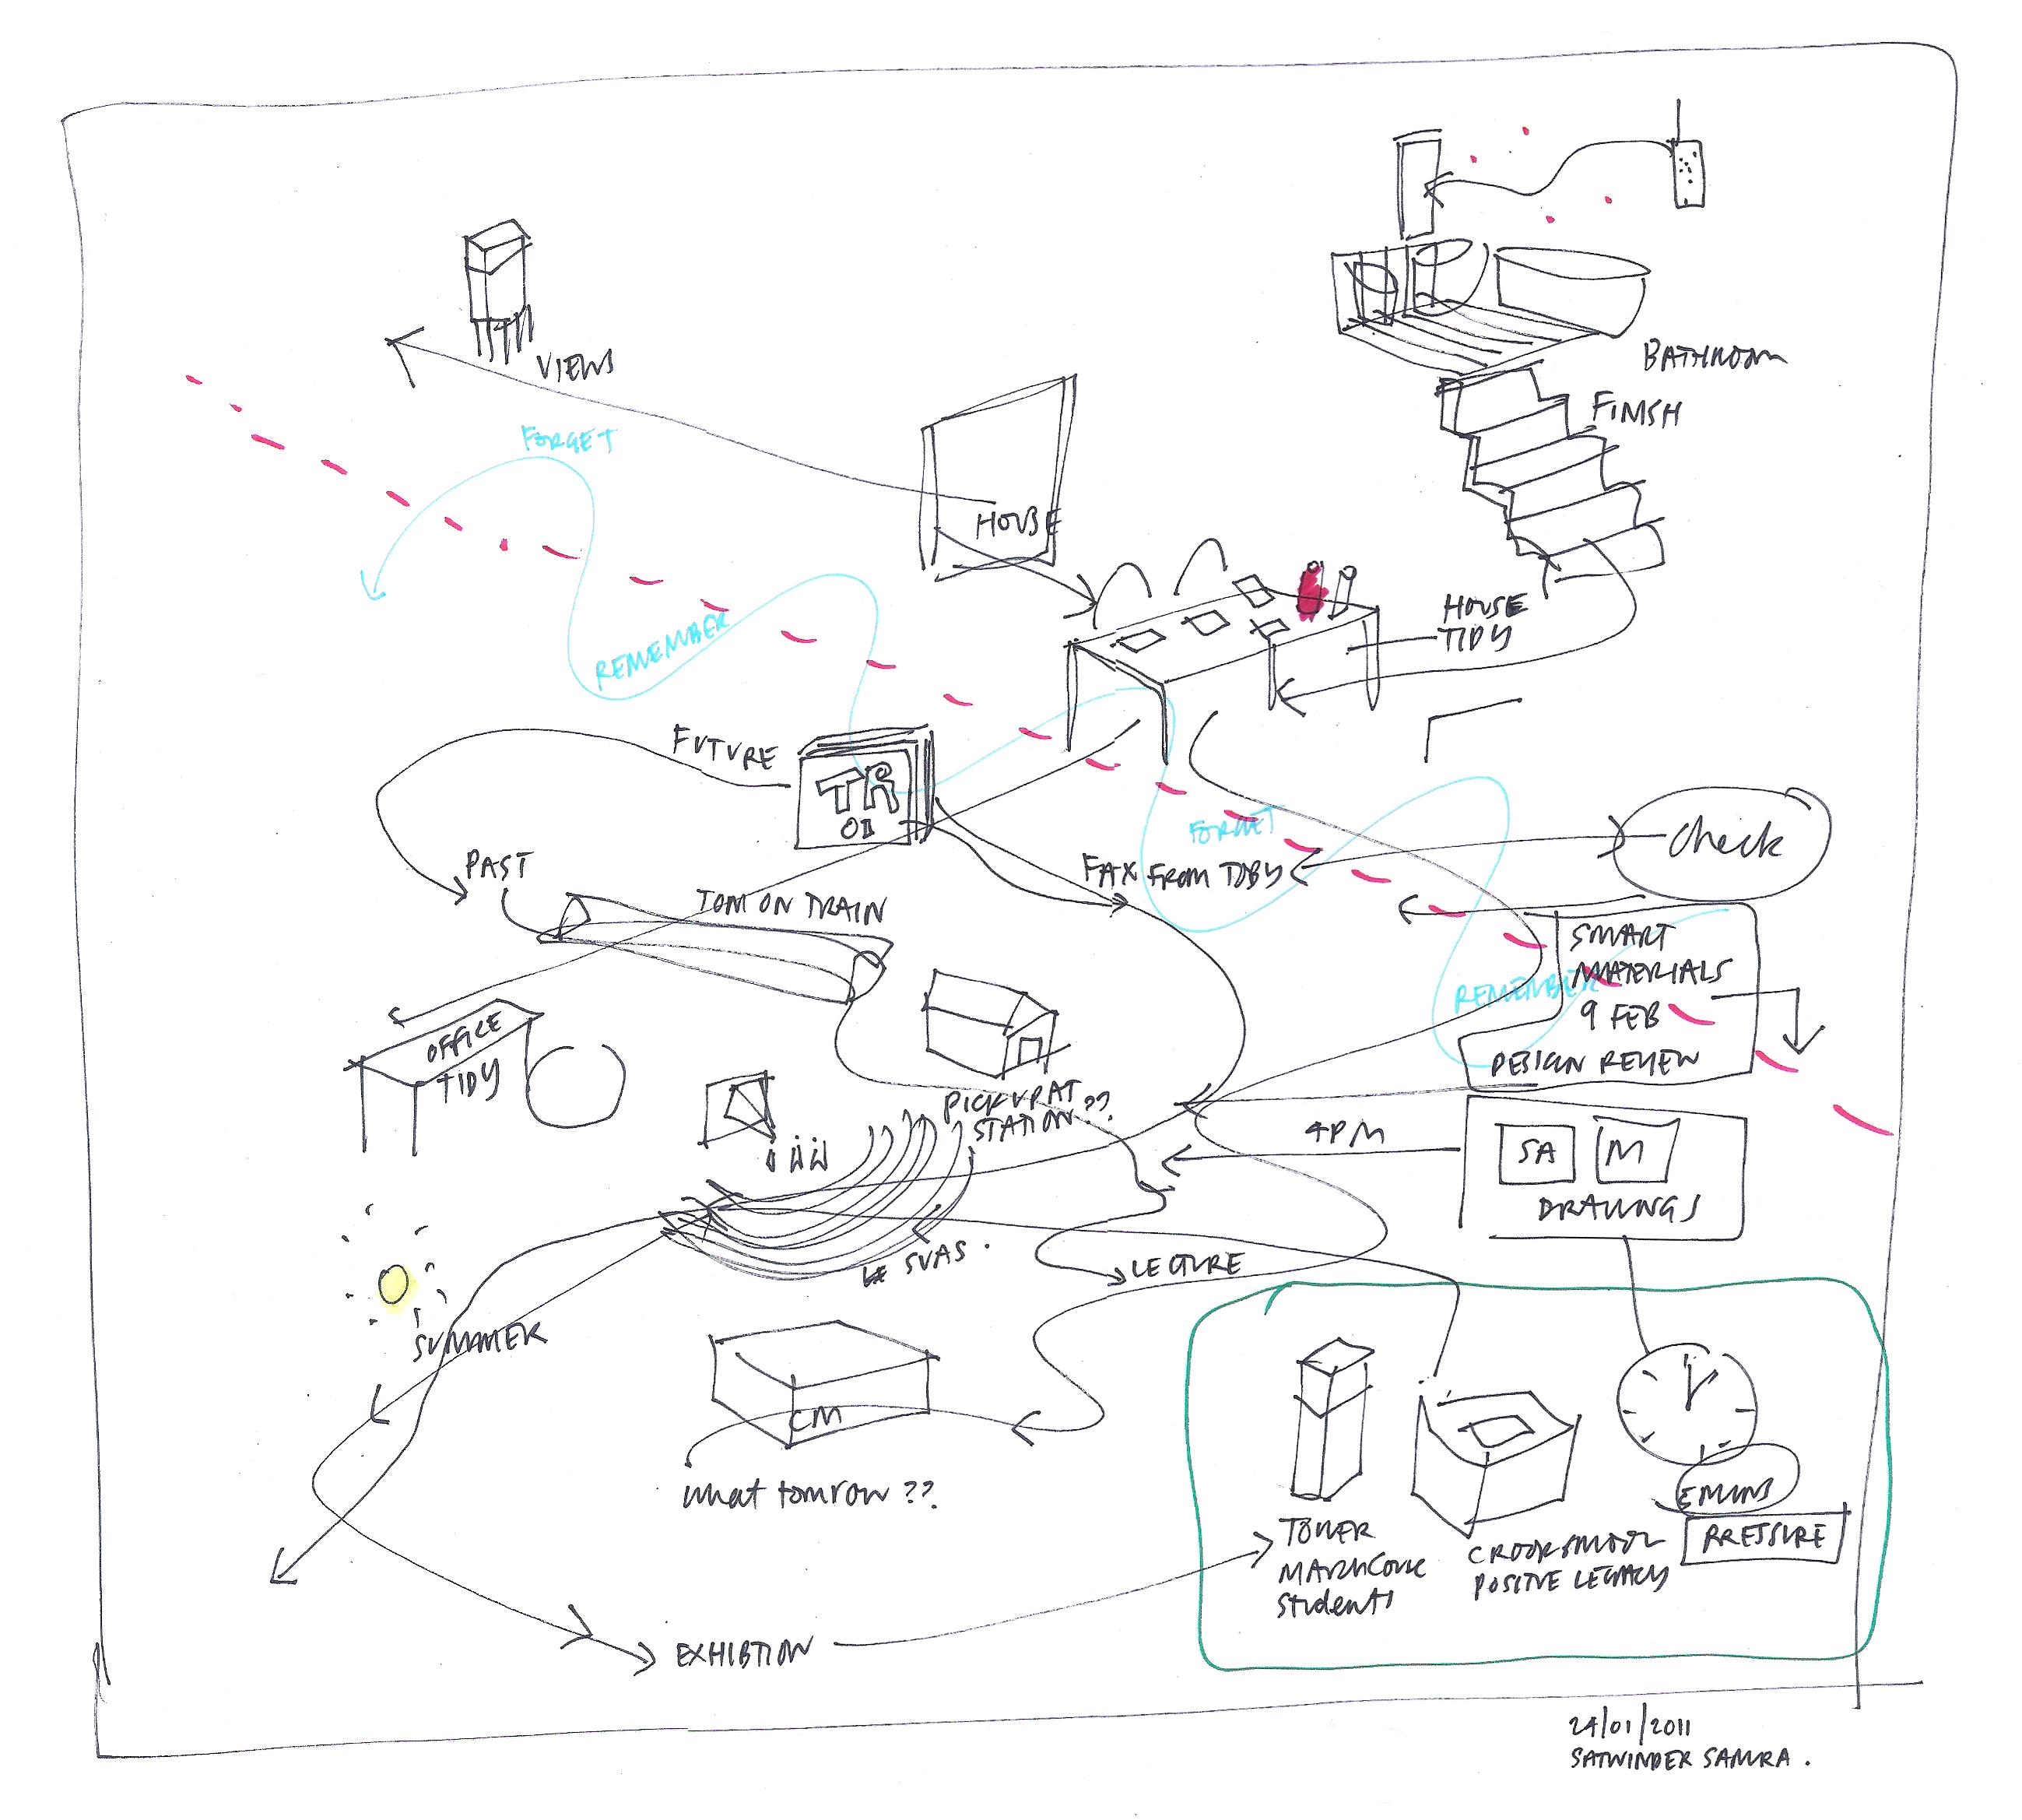 2598x2338 Testing The Studio Teaching Innovation Satwinder Samra Sam'S